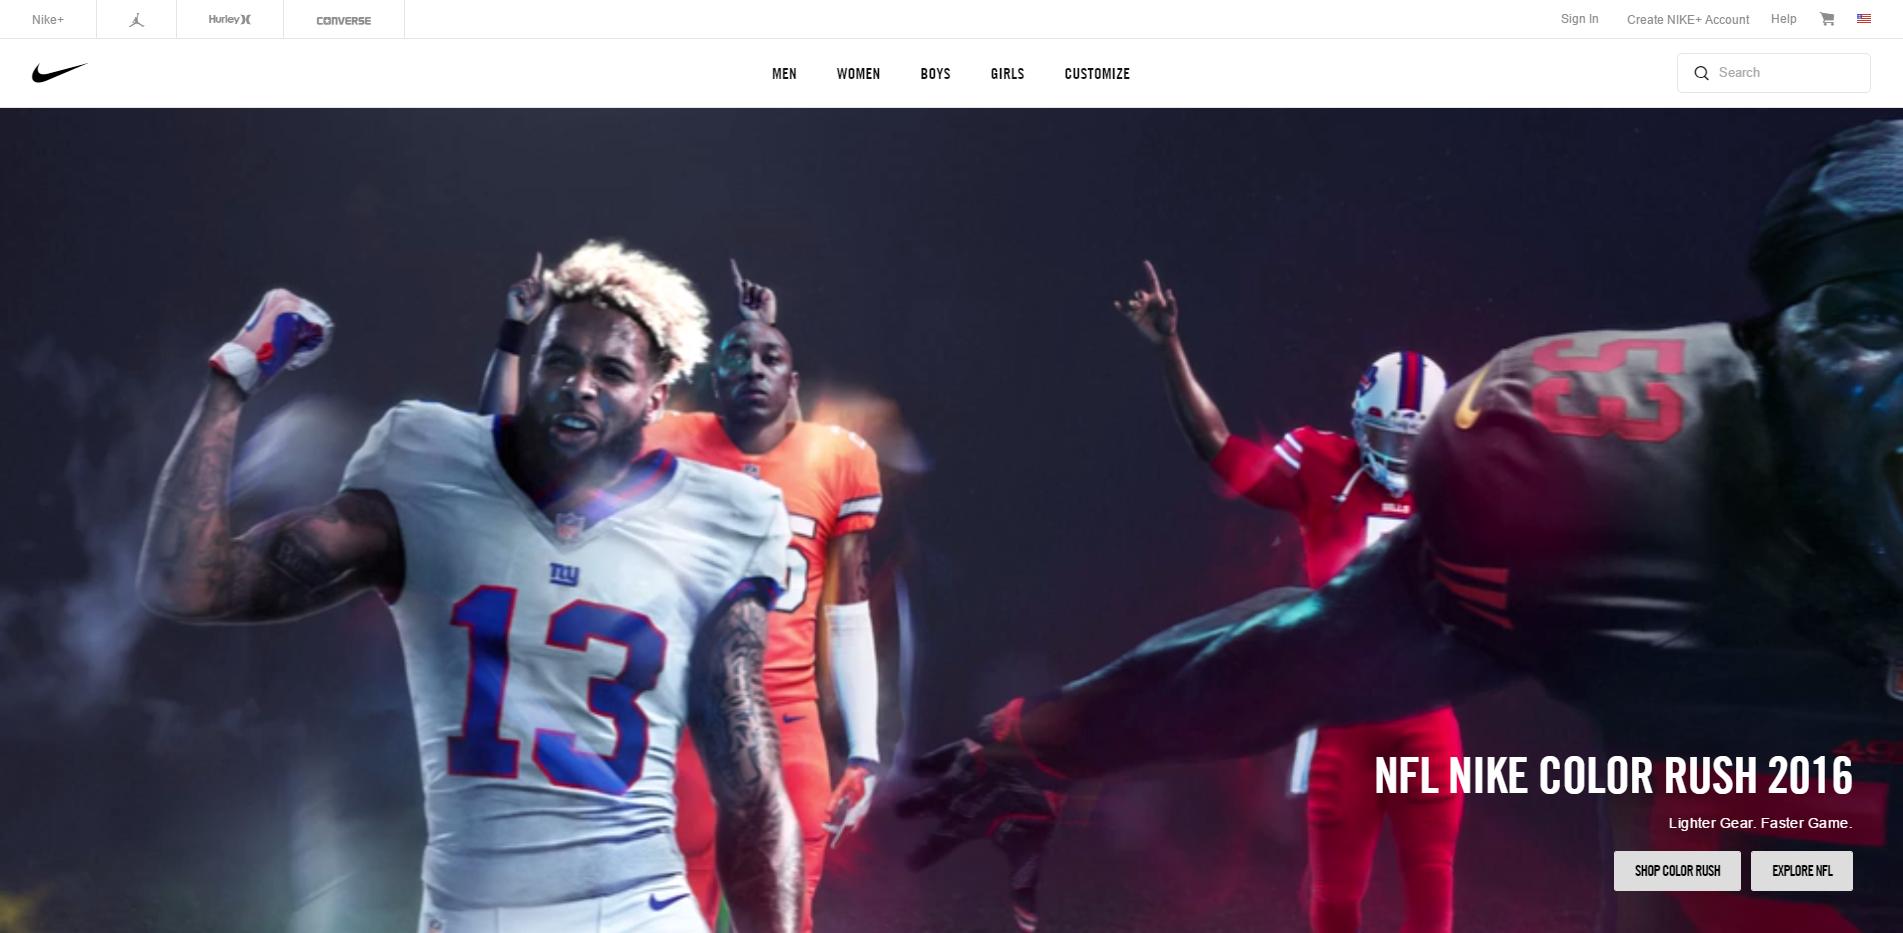 Nike's homepae